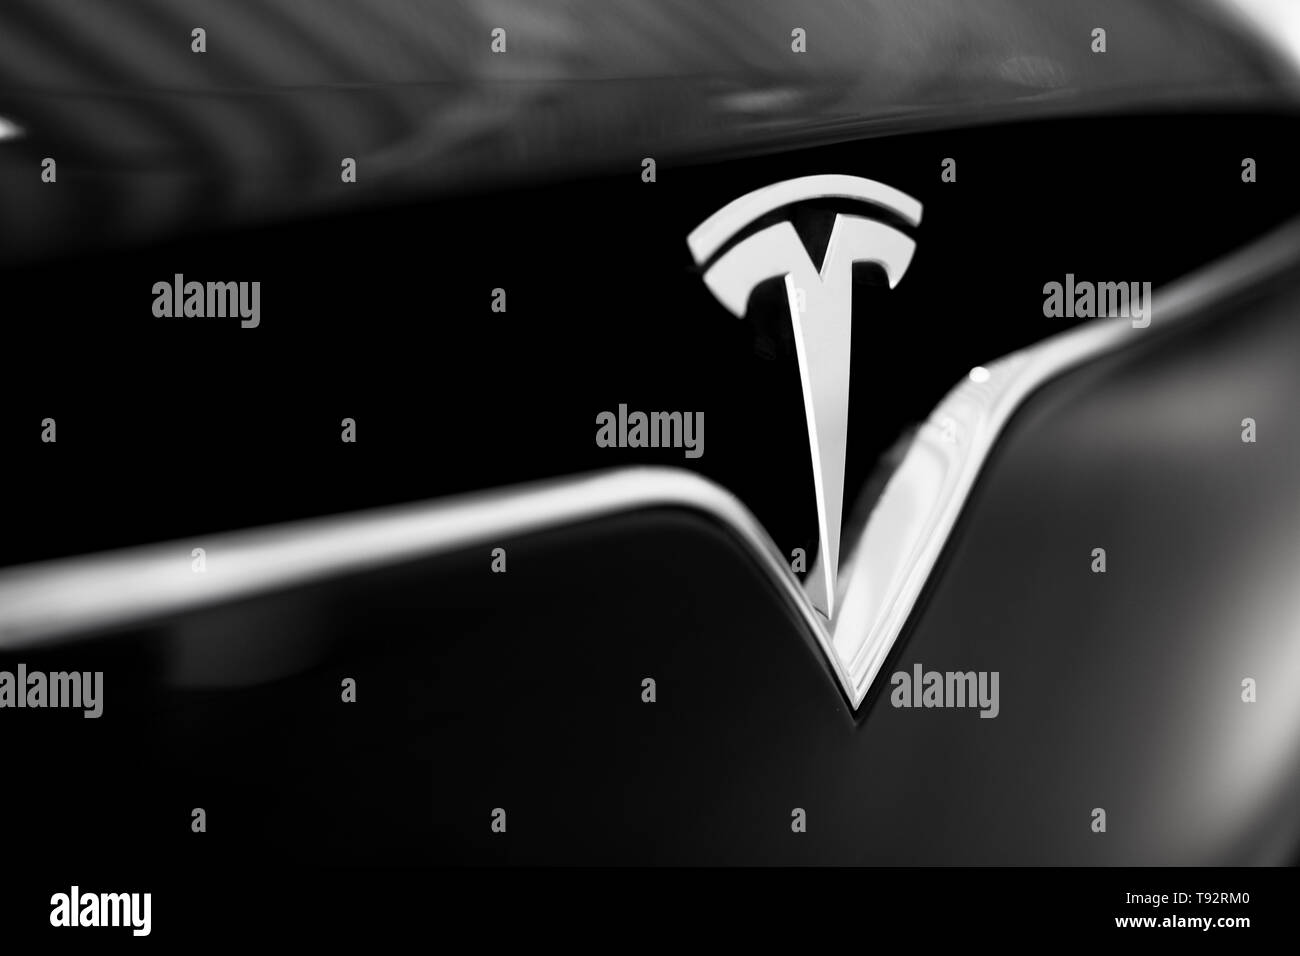 Tesla Emblem On Black Car Close Up Silver Logo Stock Photo Alamy